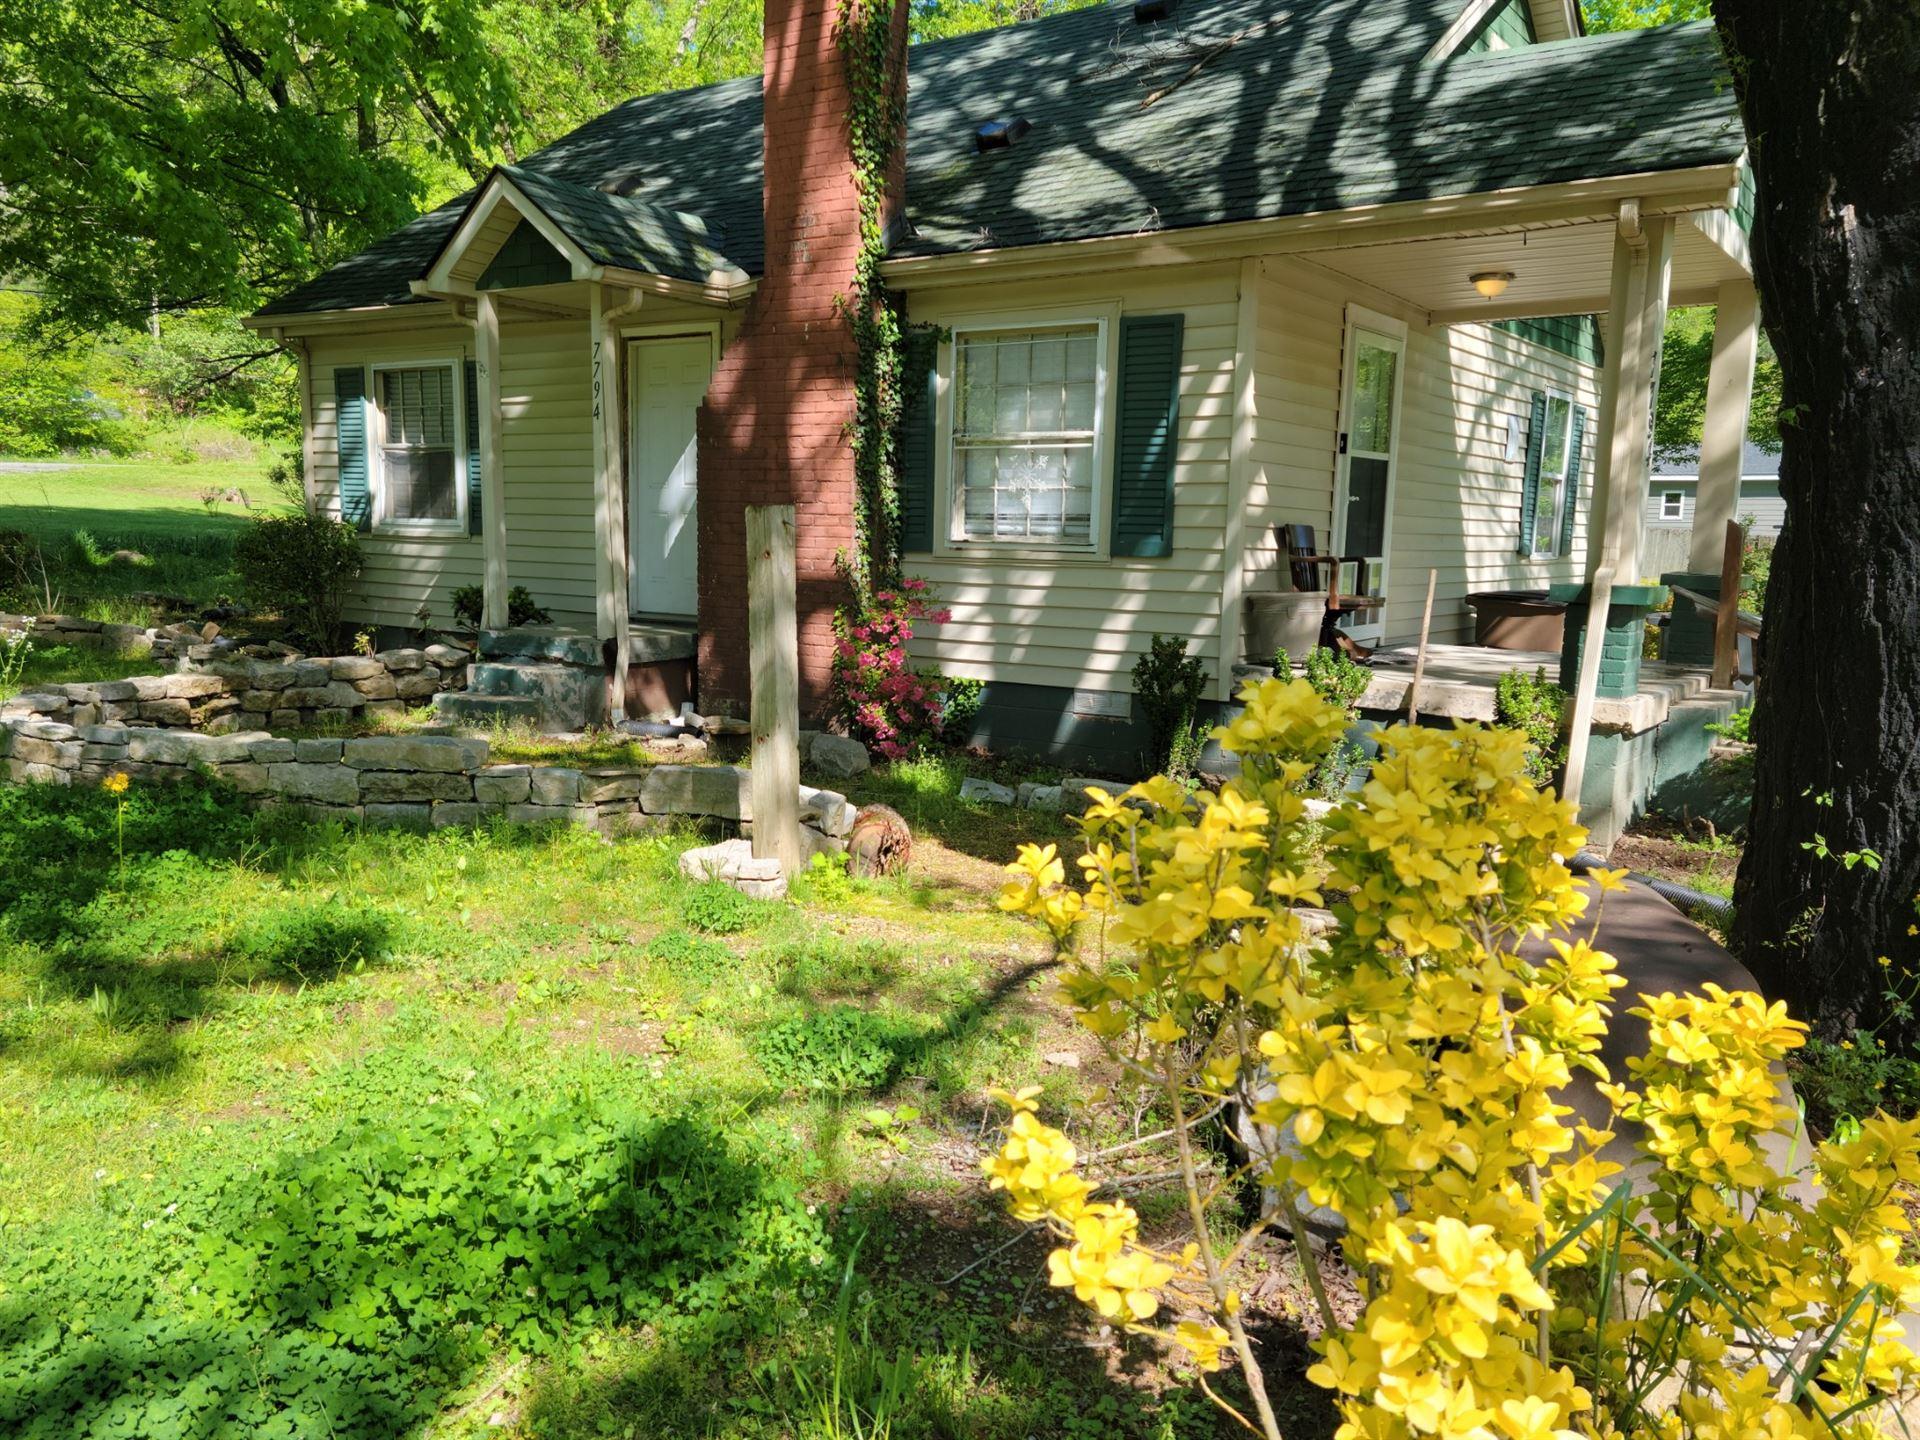 7794 Old Charlotte Pike, Nashville, TN 37209 - MLS#: 2245476